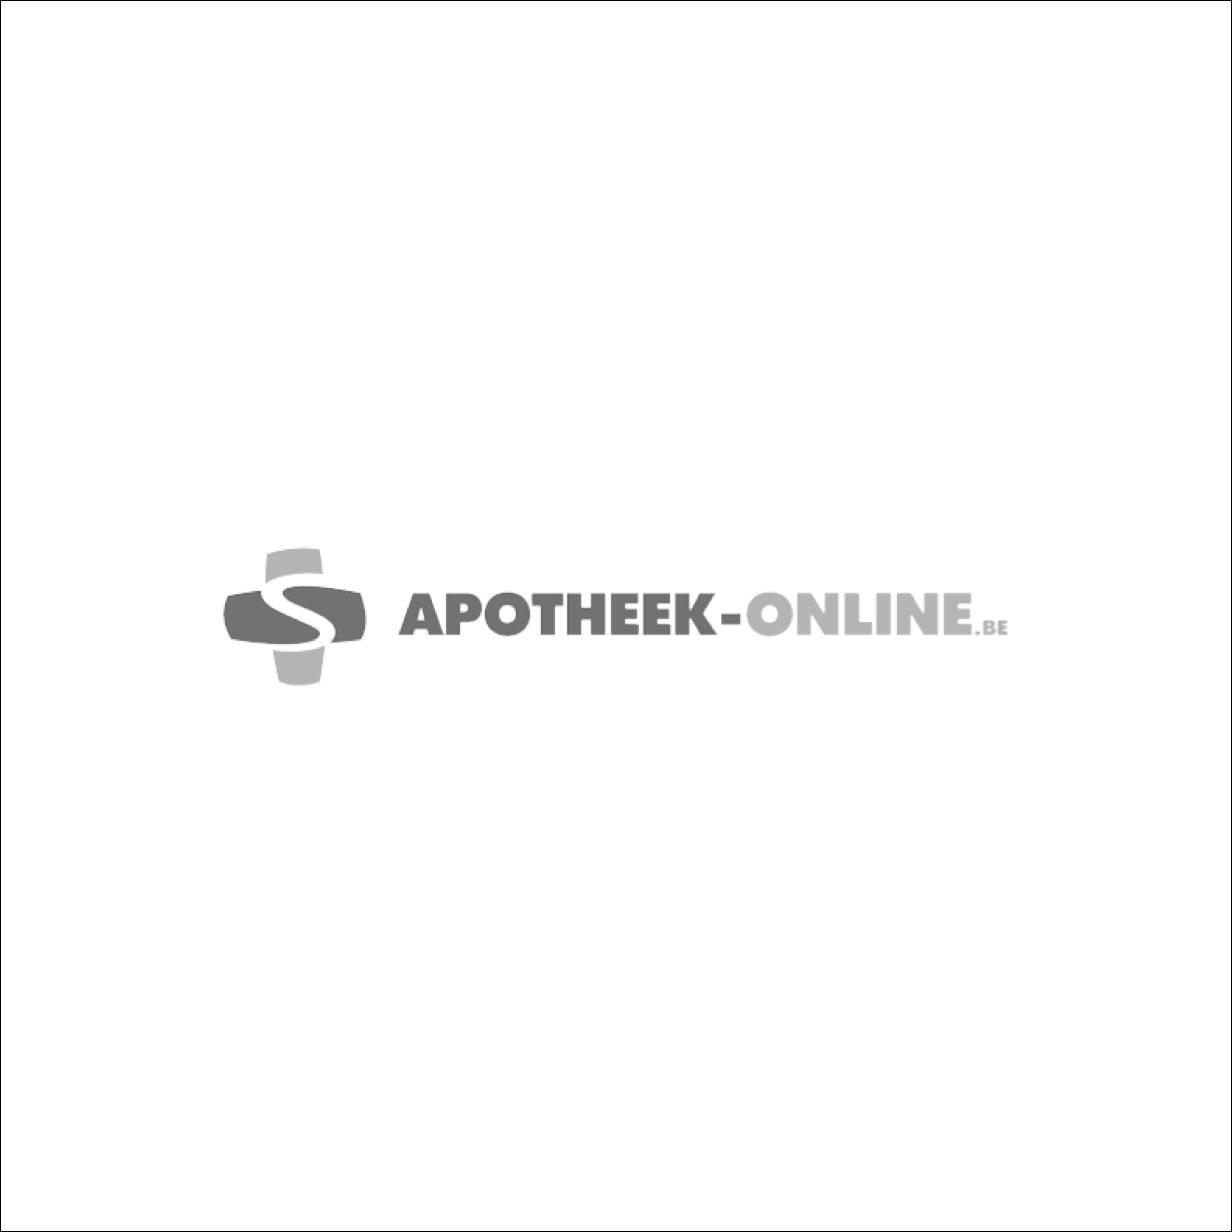 MESOFT CP N/ST 4C 10,0X10,0CM 200 156300